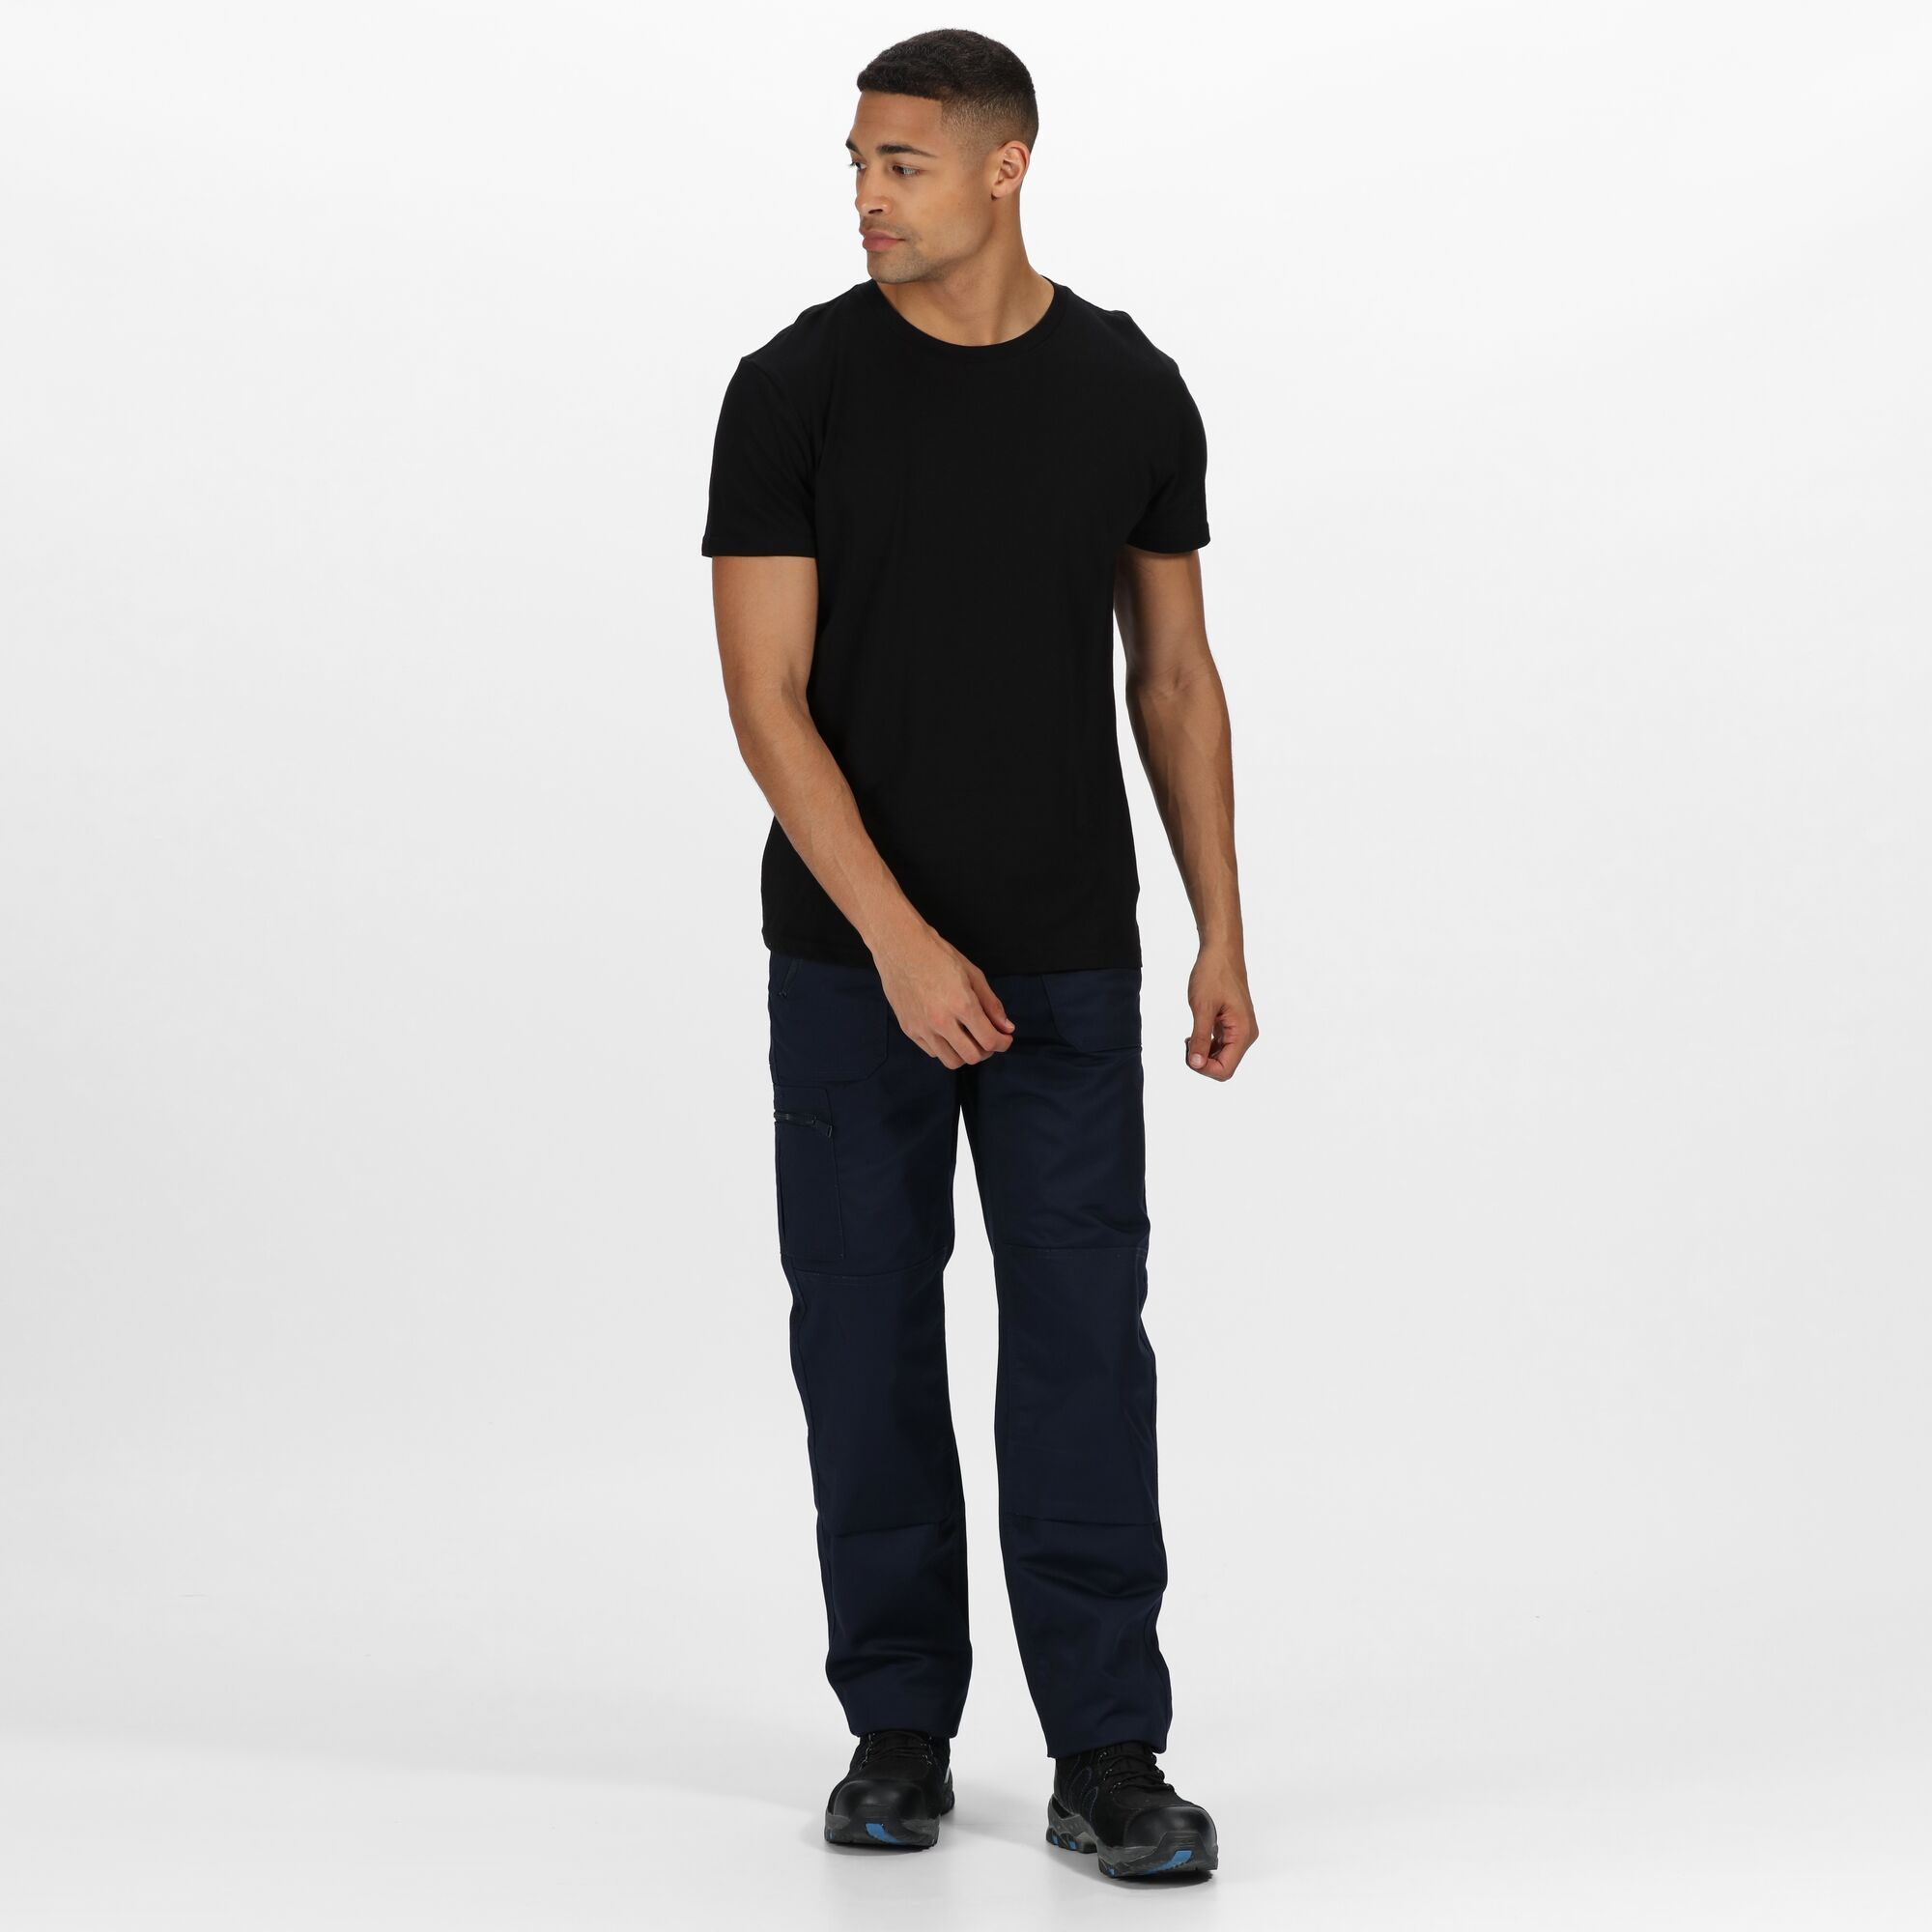 Regatta Mens Pro Action Waterproof Trousers - Regular